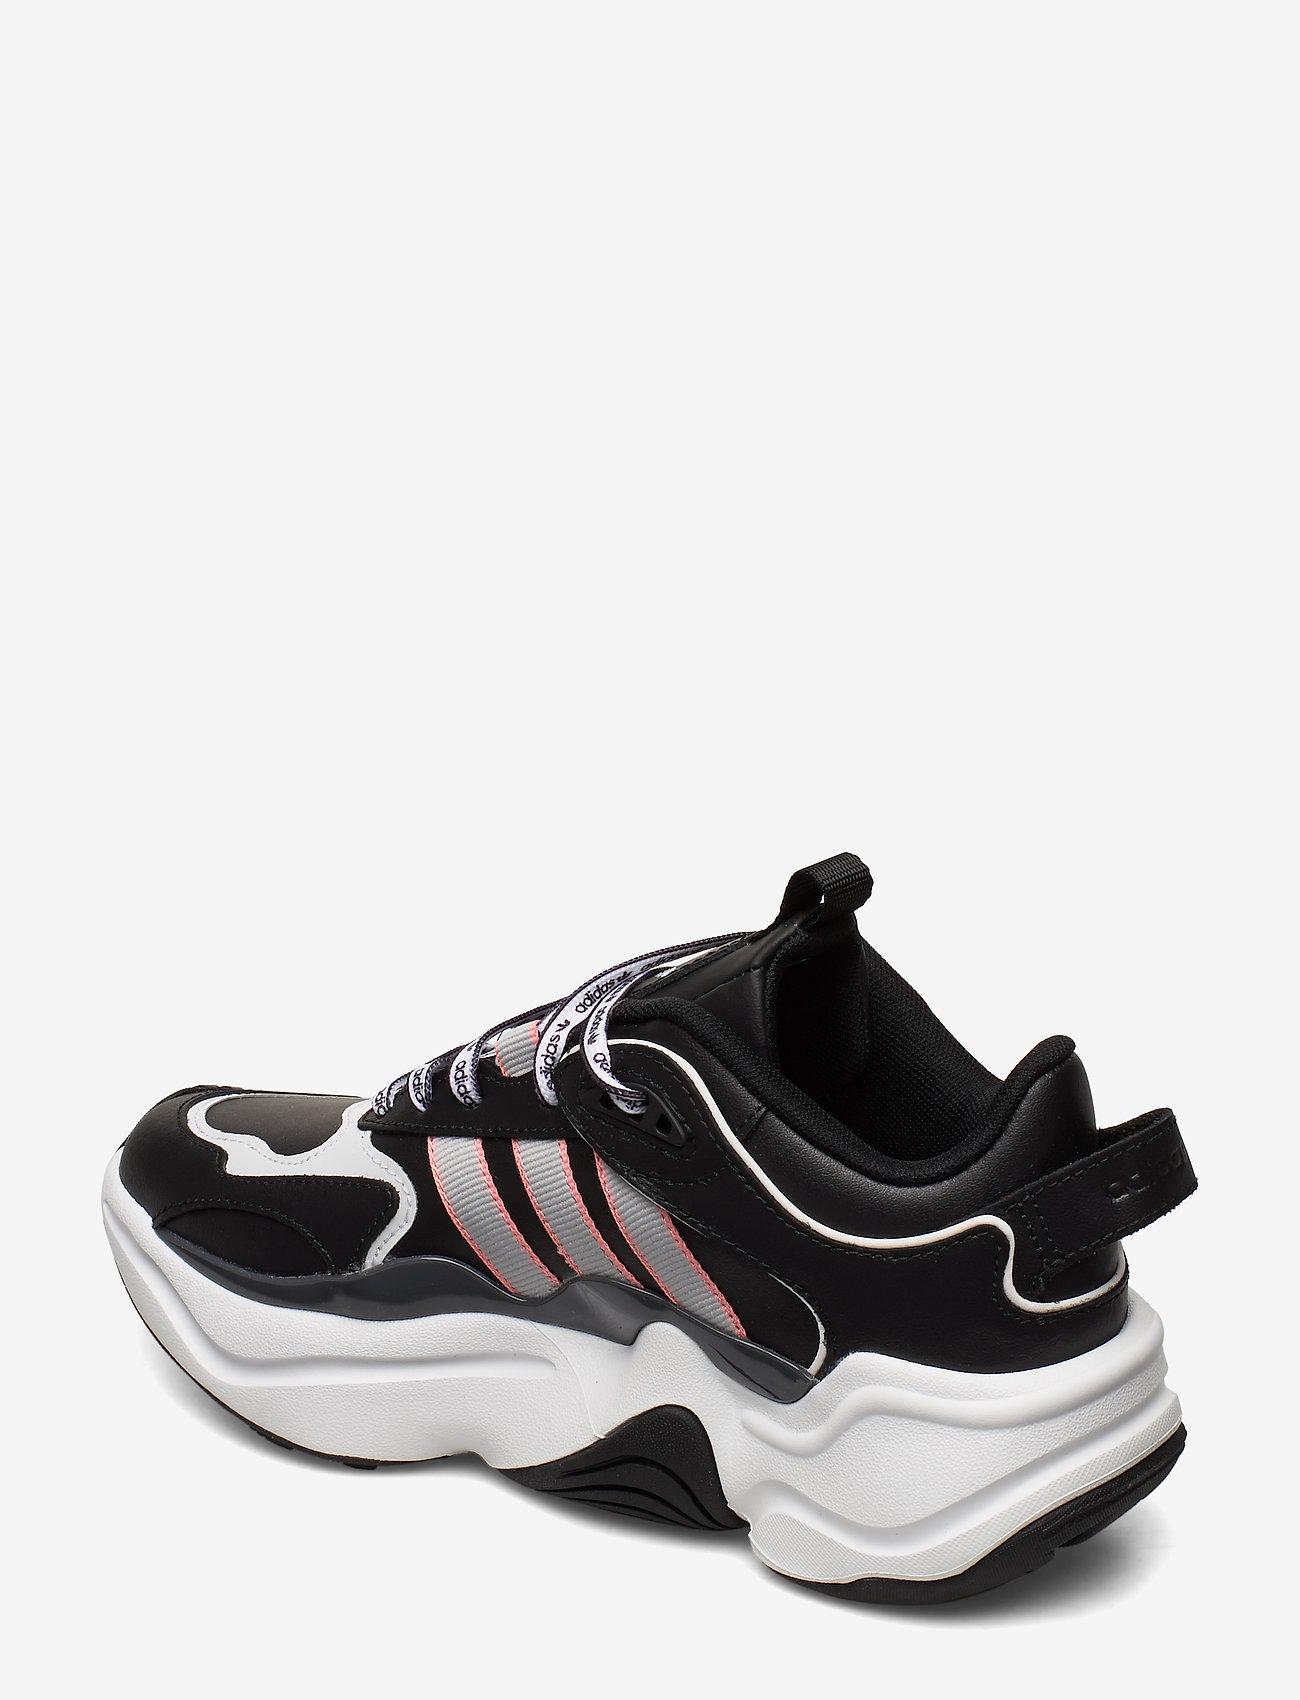 Magmur Runner W (Cblack/gretwo/glopnk) - adidas Originals